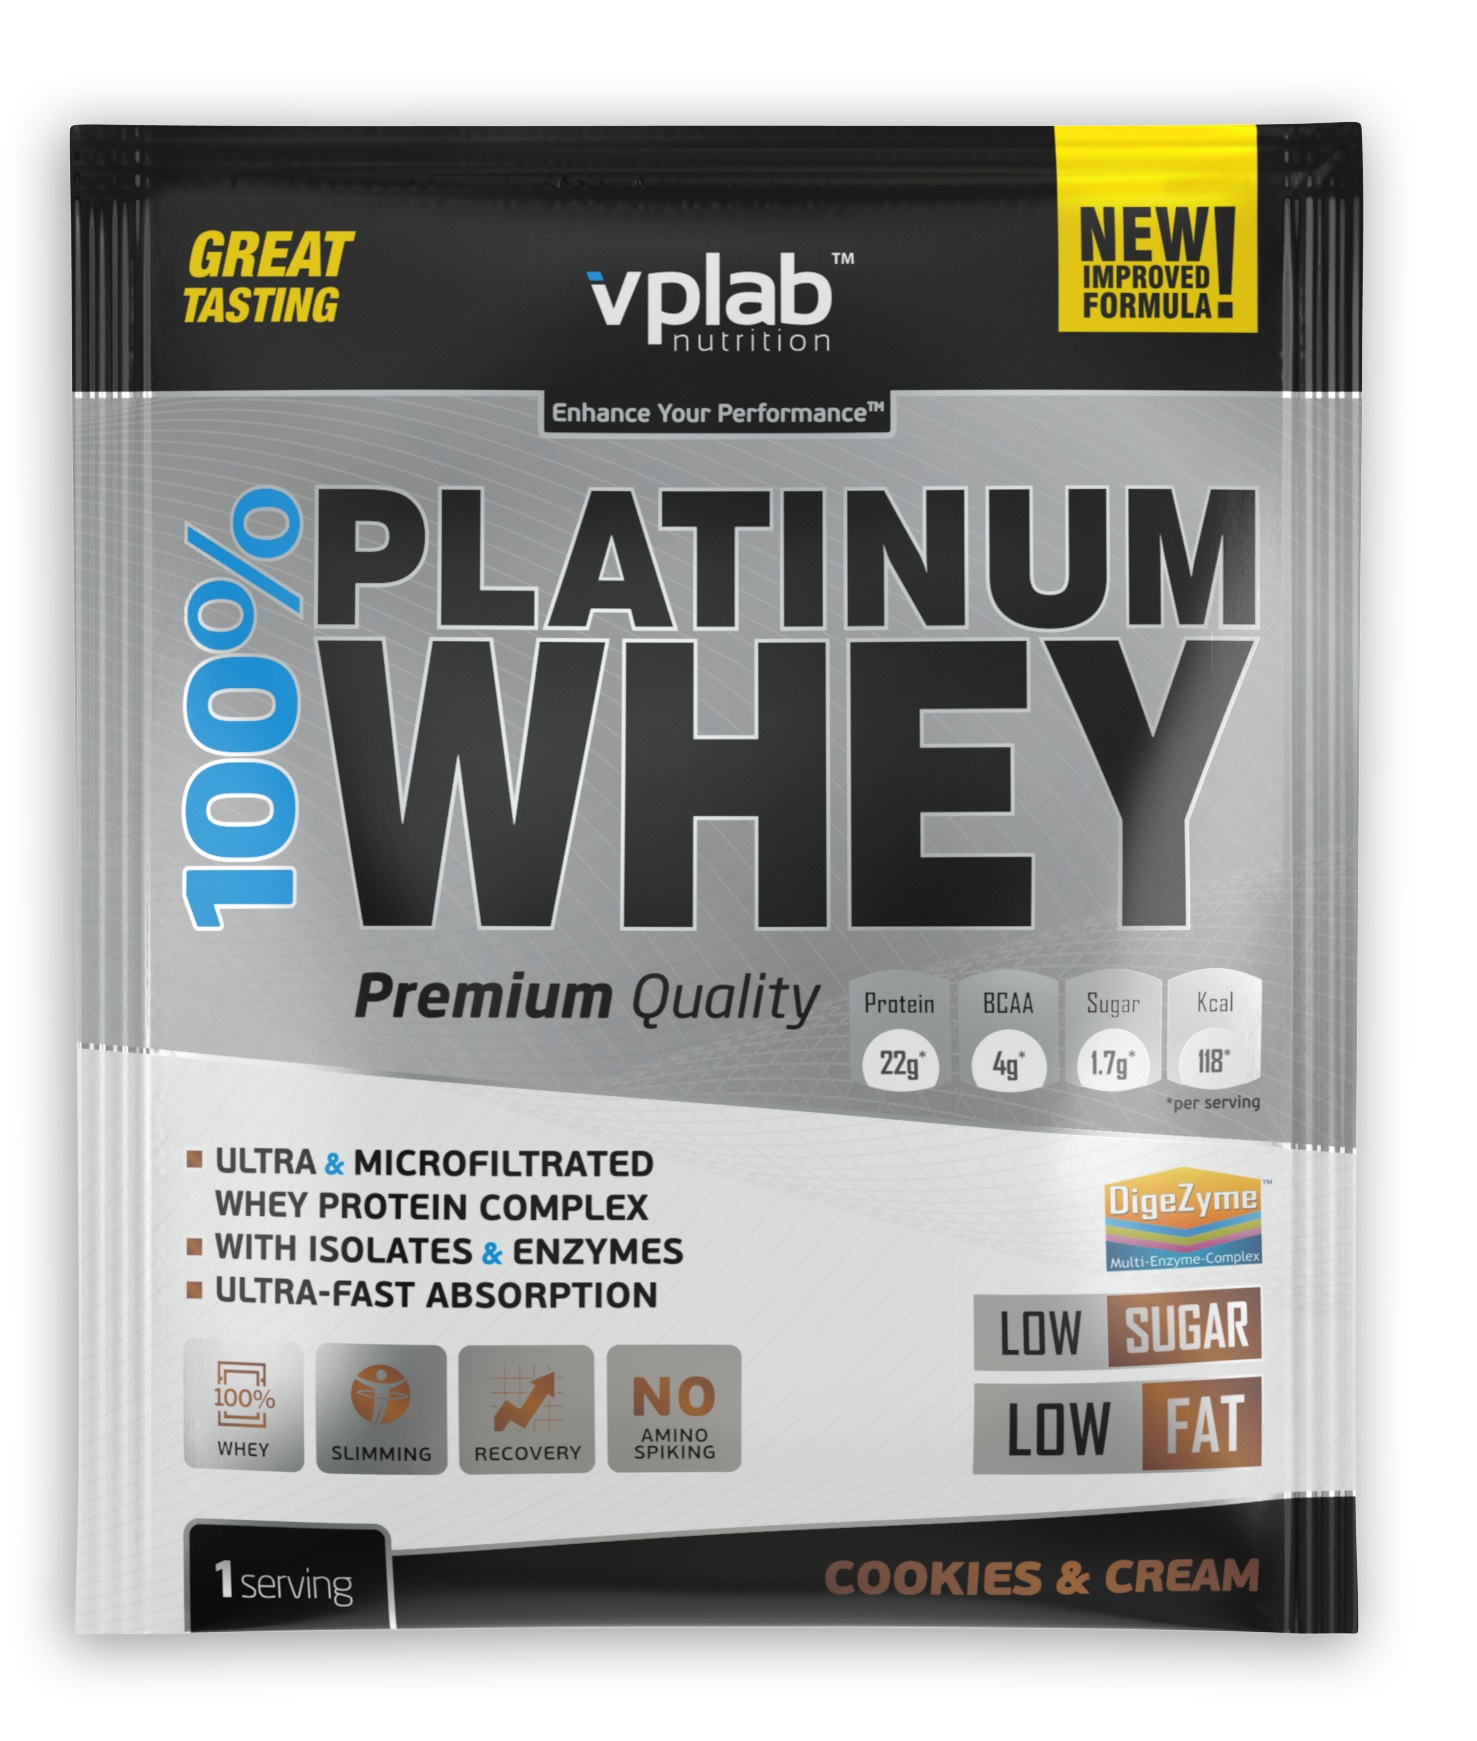 Vplab nutrition Протеин nutrition, печенье и крем